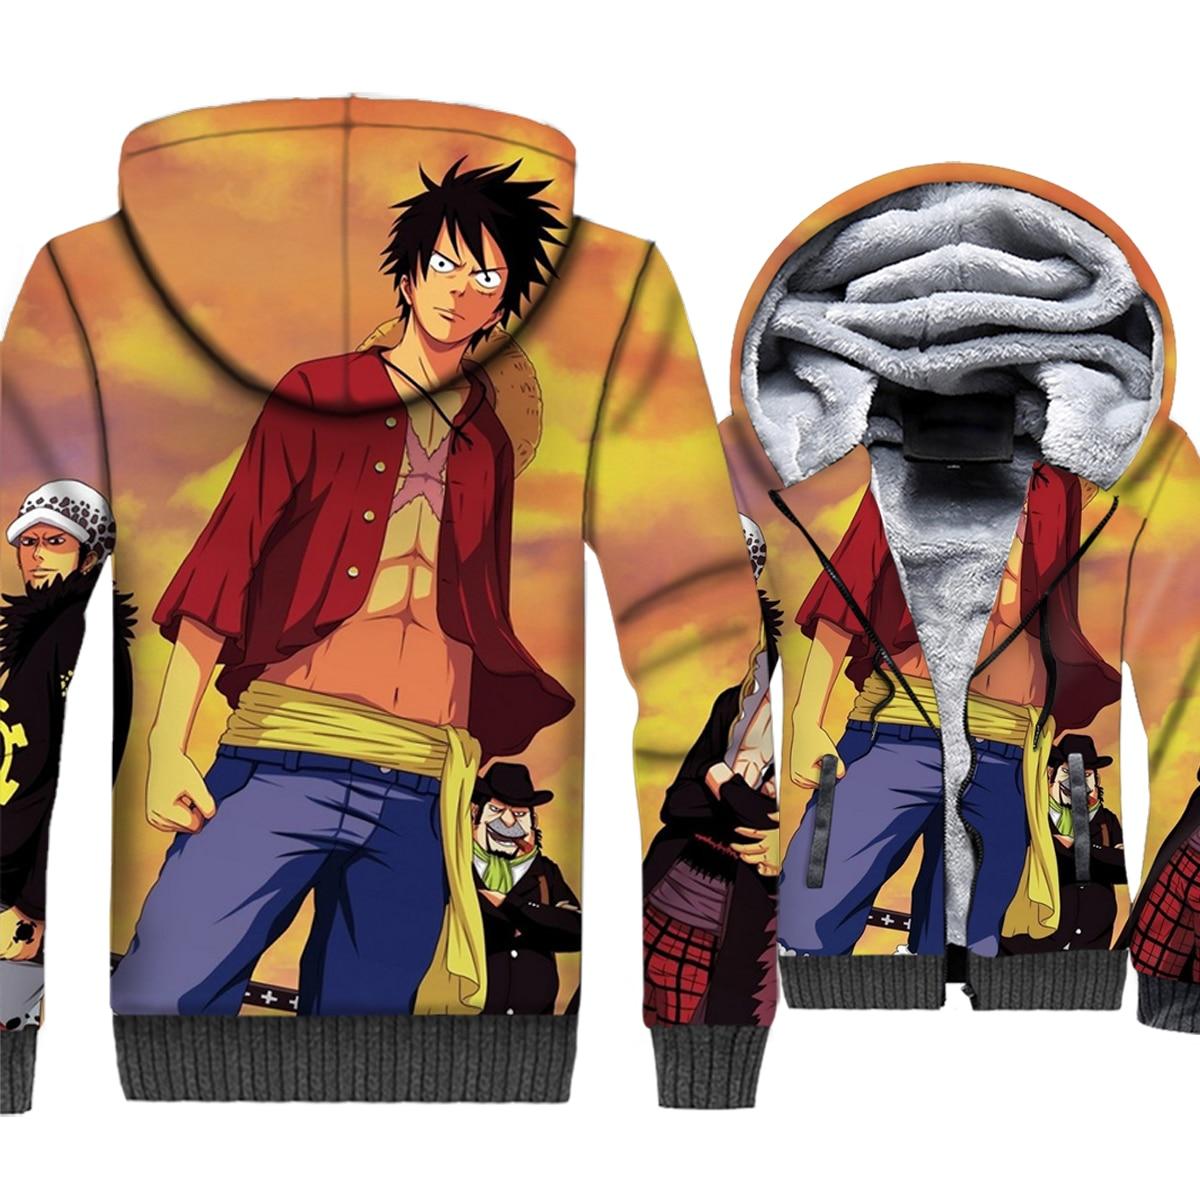 Japanese Anime One Piece 3D Print Hoodie Men Luffy Hooded Sweatshirt 2018 Winter Thick Fleece Zip up Jacket The Pirate King Coat